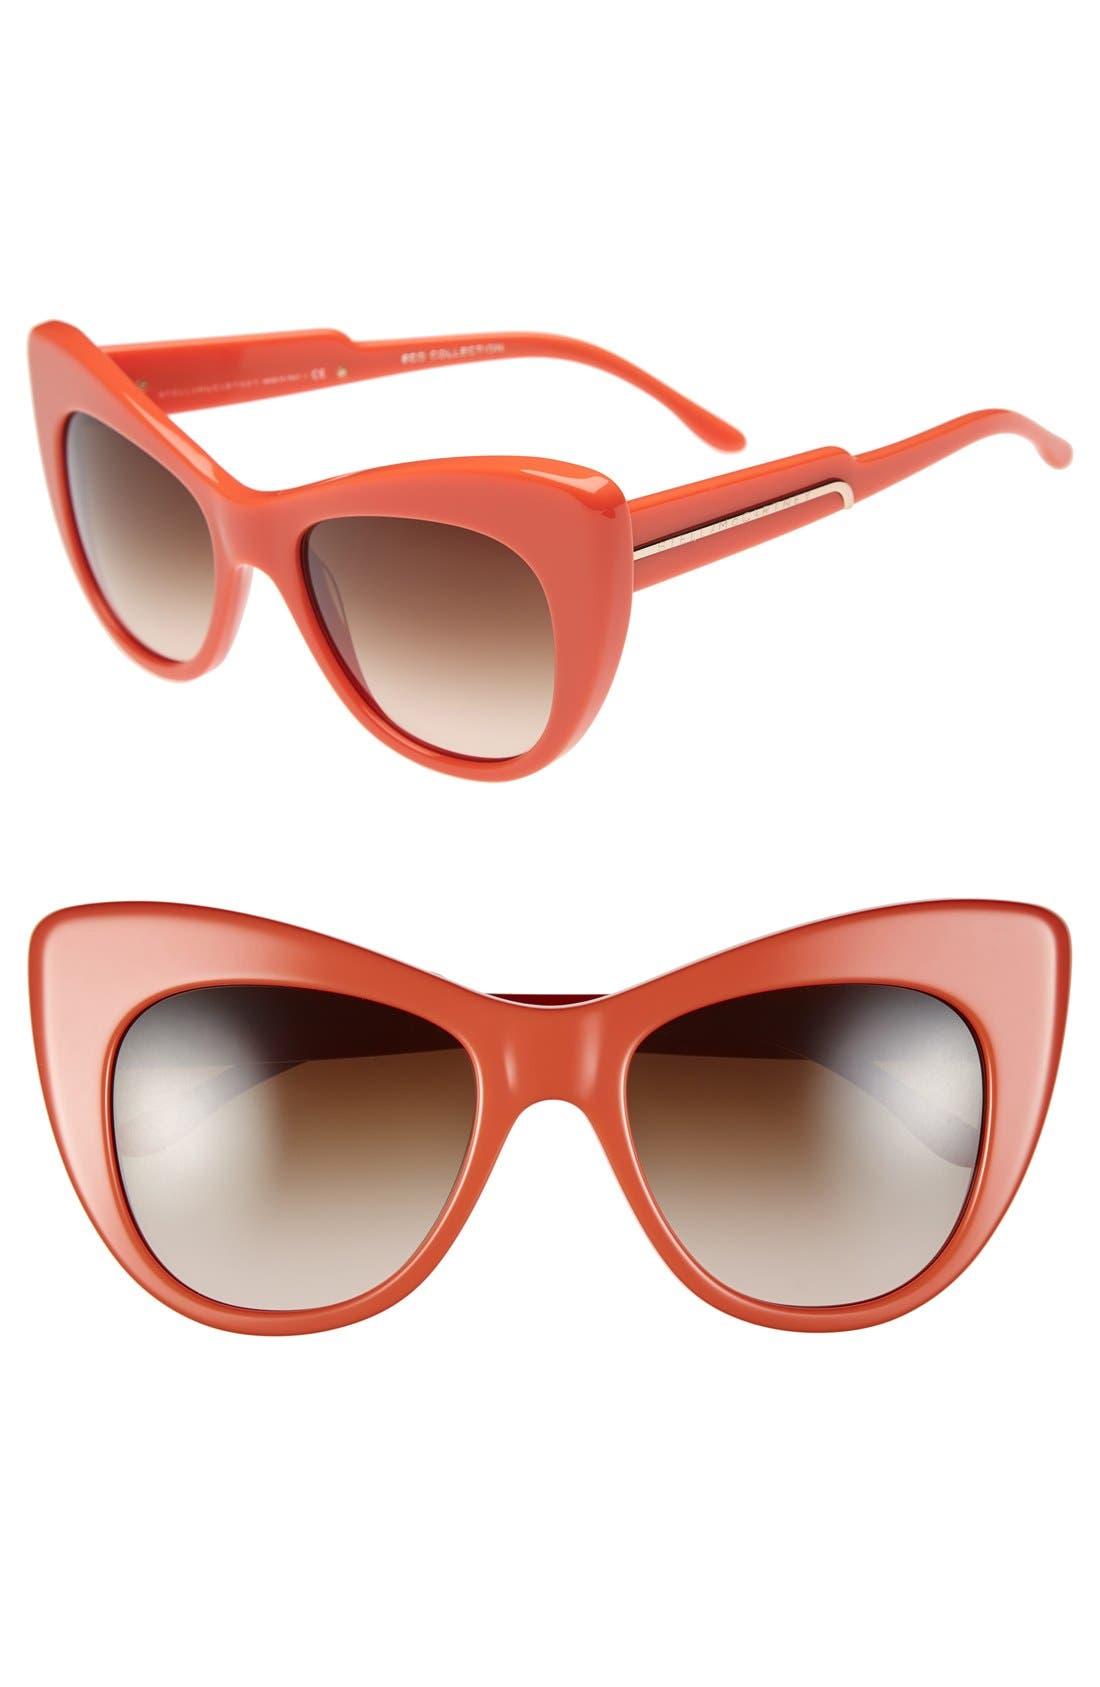 Main Image - Stella McCartney 54mm Cat Eye Sunglasses